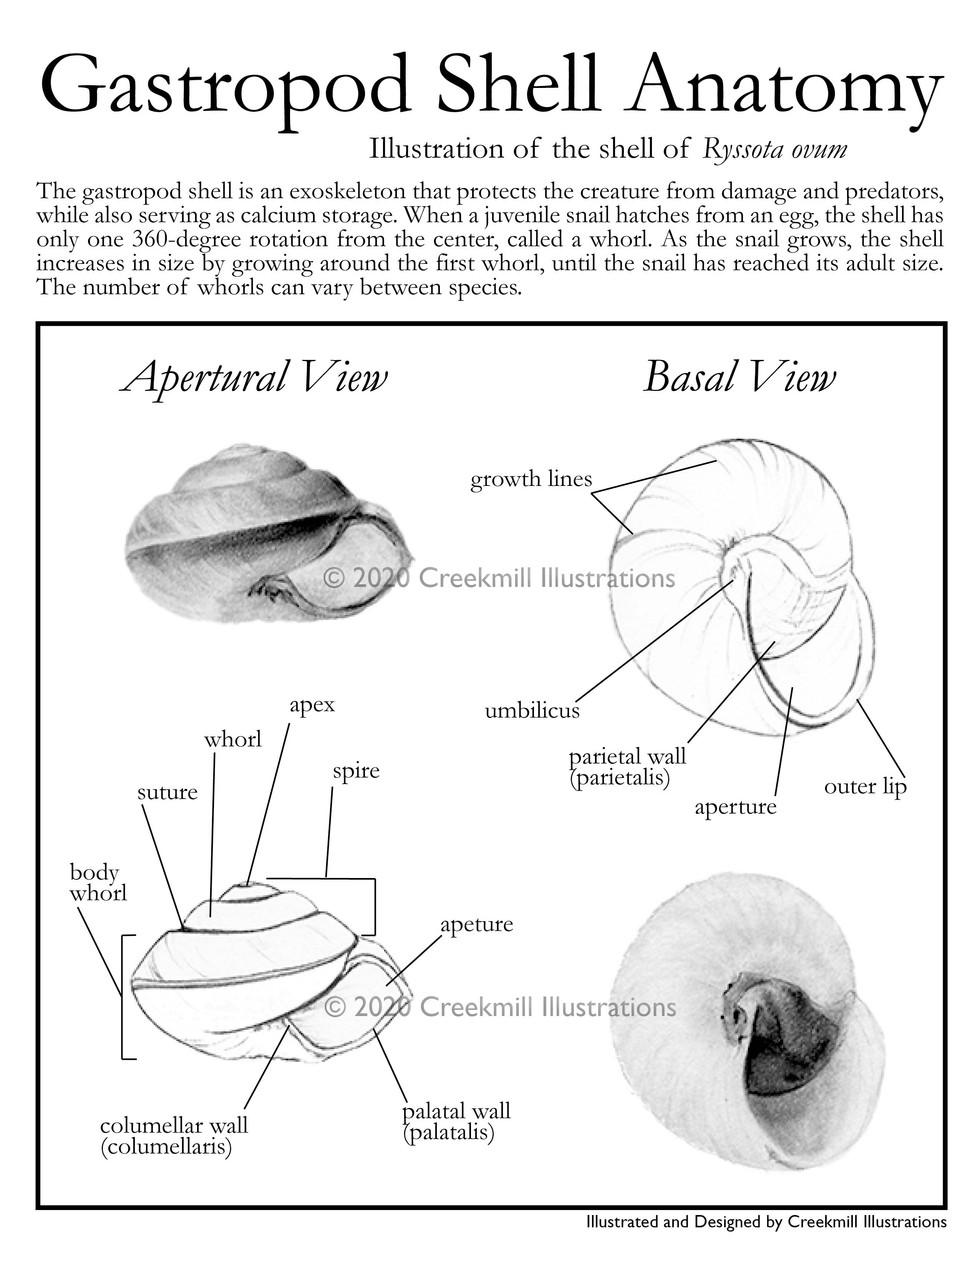 Gastropod Shell Anatomy Poster